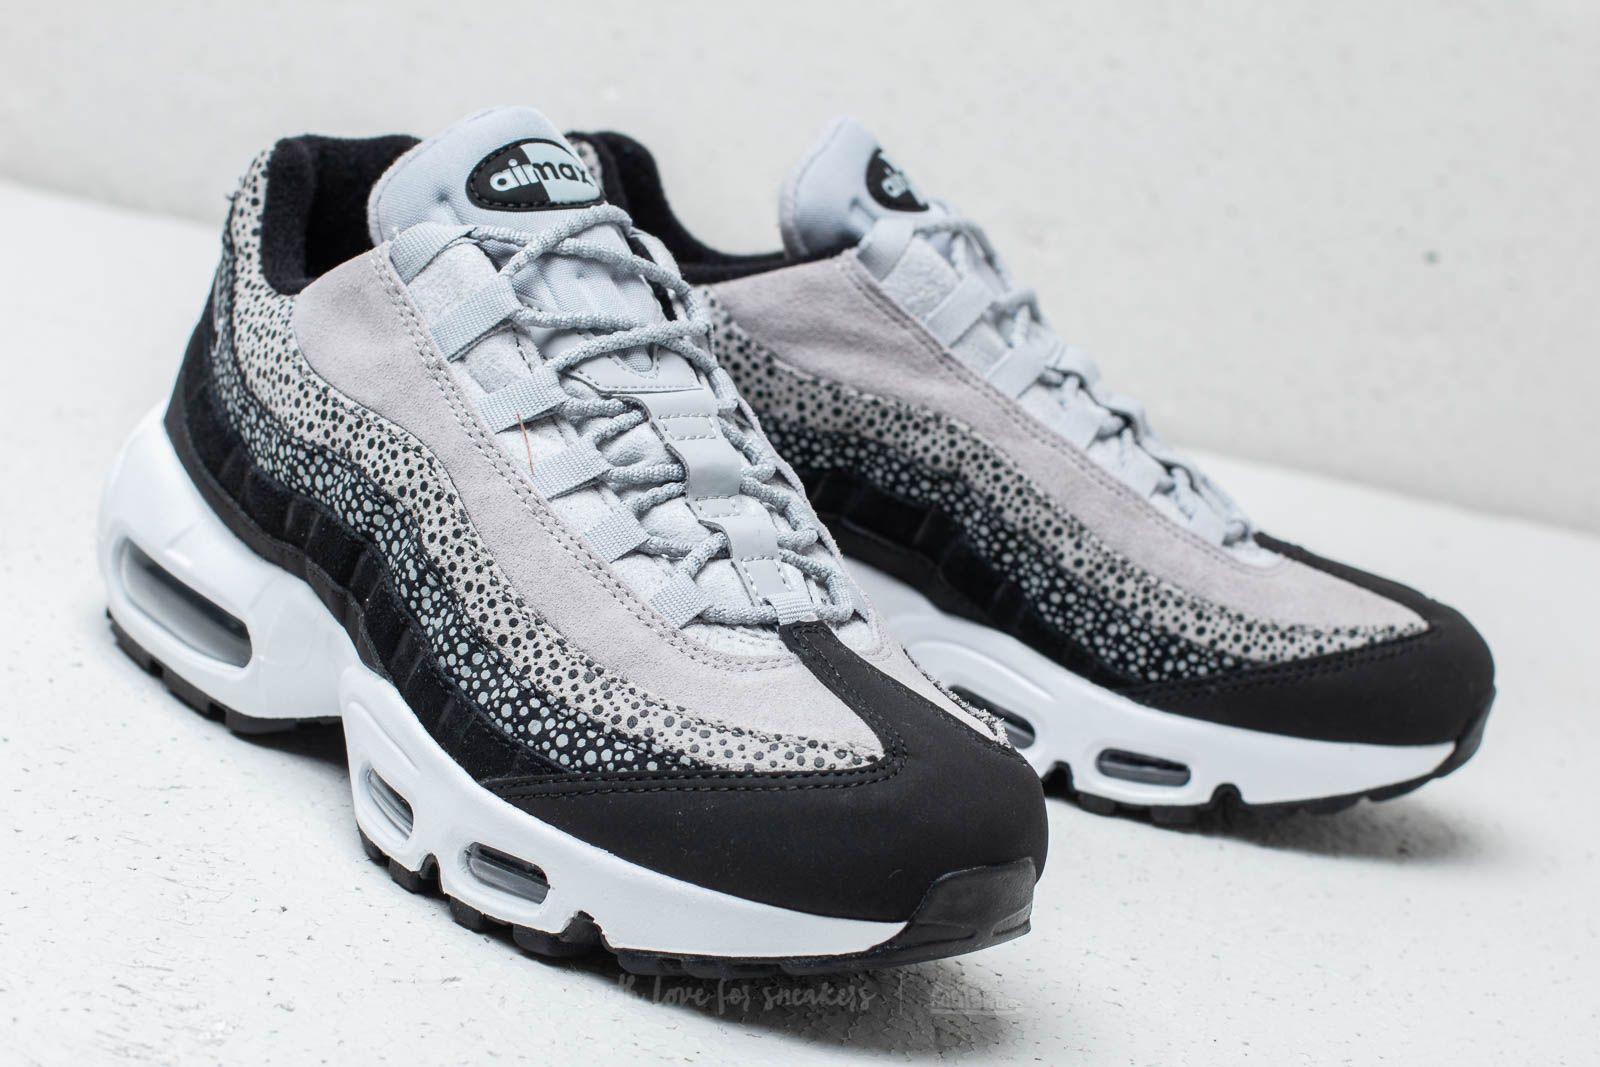 the latest eef63 8bf3c Nike Wmns Air Max 95 Premium Black/ Black-Wolf Grey-White ...